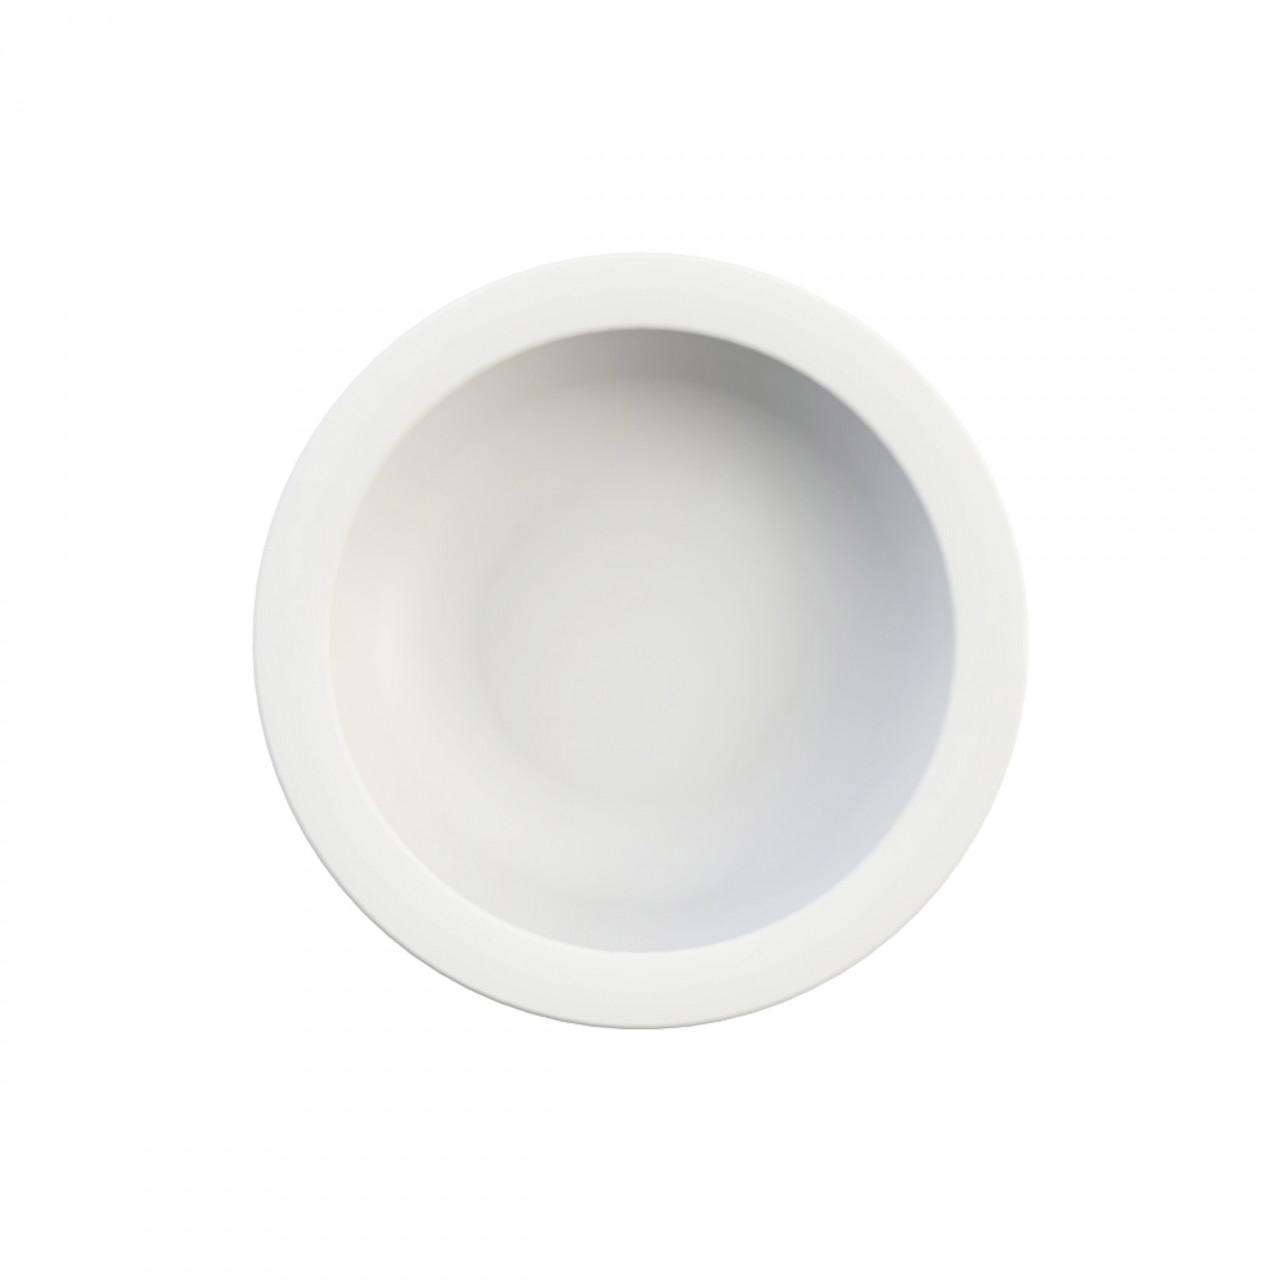 Waca PBT Teller tief weiß | 4009085269414